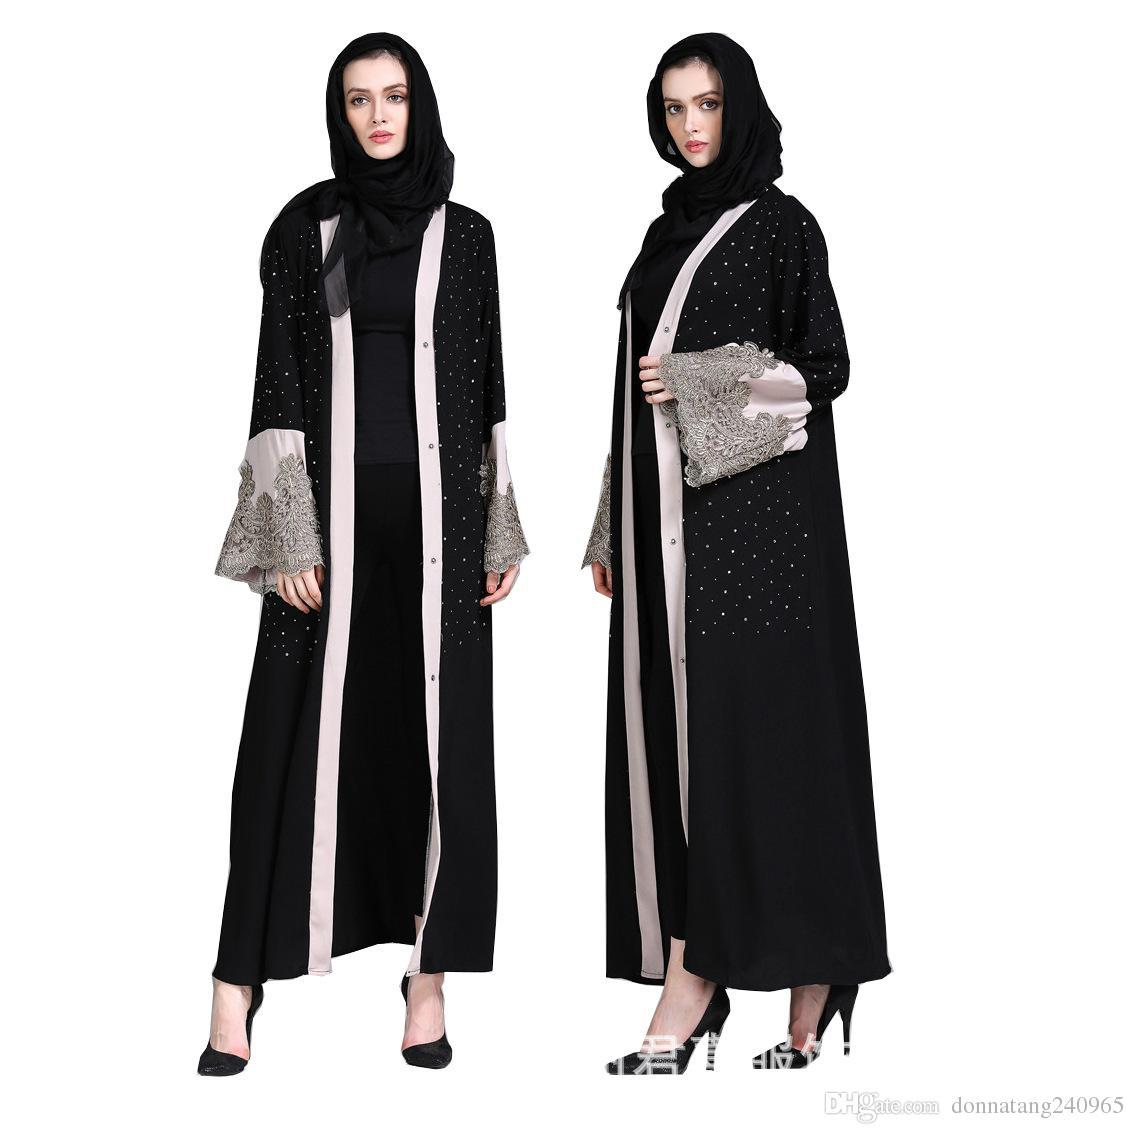 Mother & Kids Strollers Accessories Women Muslim Dress Moroccan Kaftan Cardigan Lace Dress Middle East Gowns Dubai Uae Turkish Casual Maxi Long Dress Female